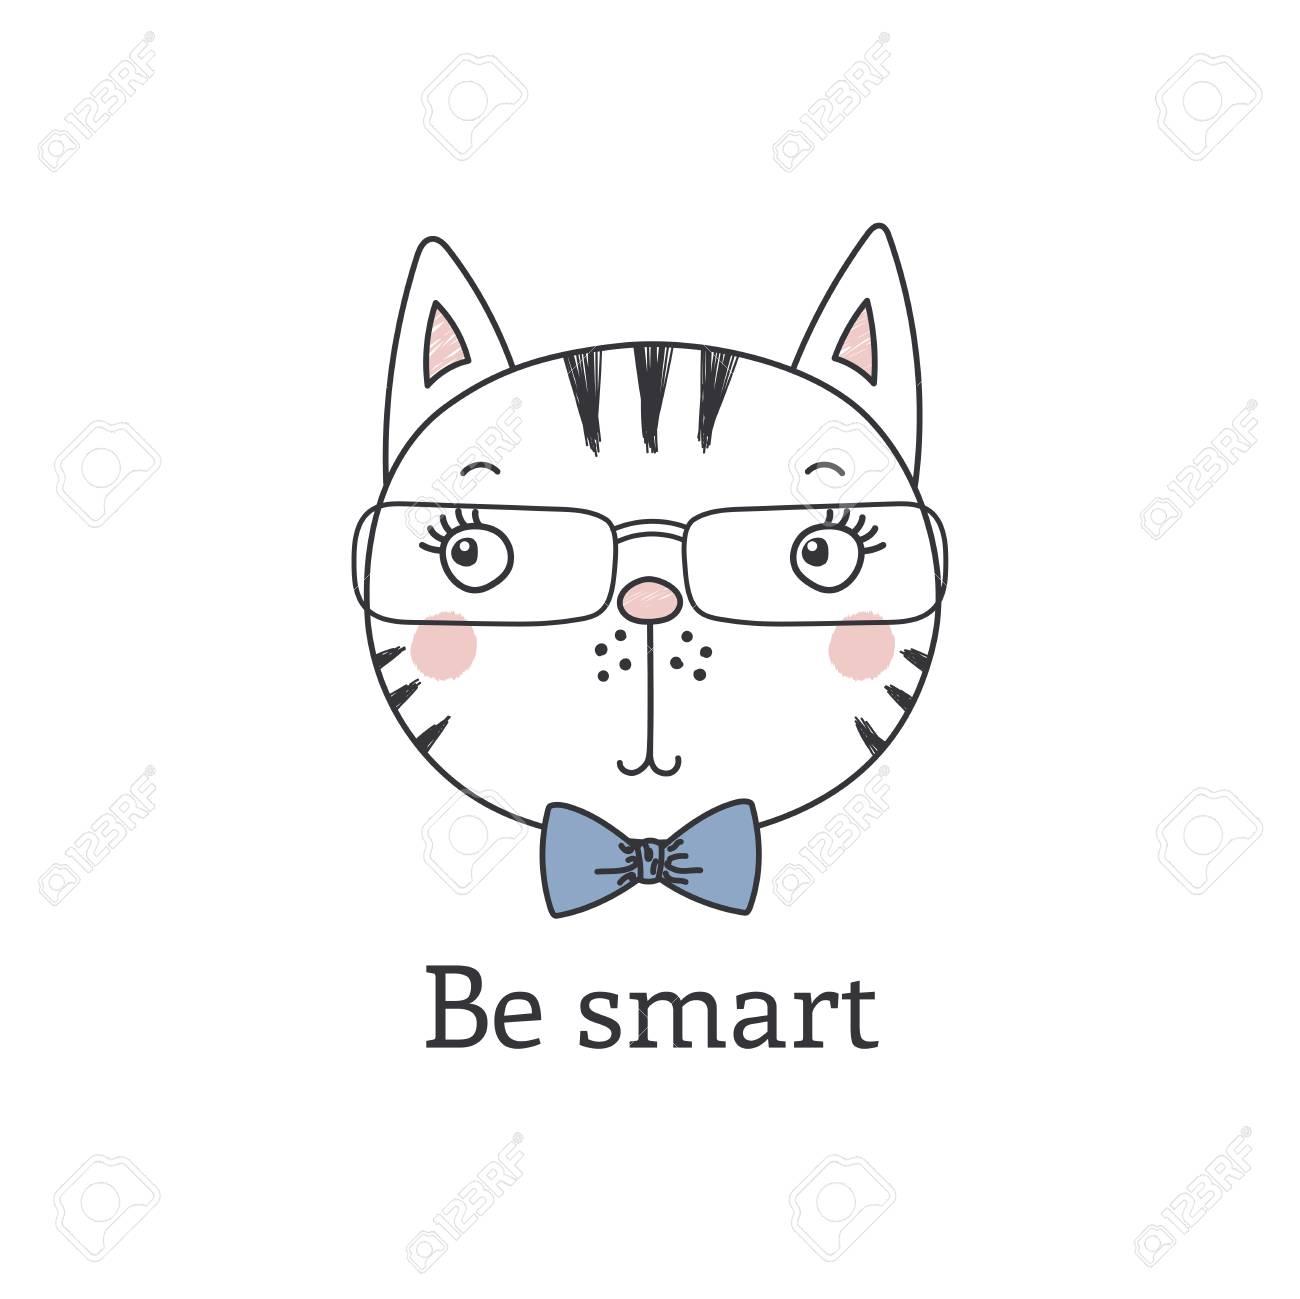 9732b28c719 Hand drawn vector portrait of a cute funny cartoon cat boy in glasses